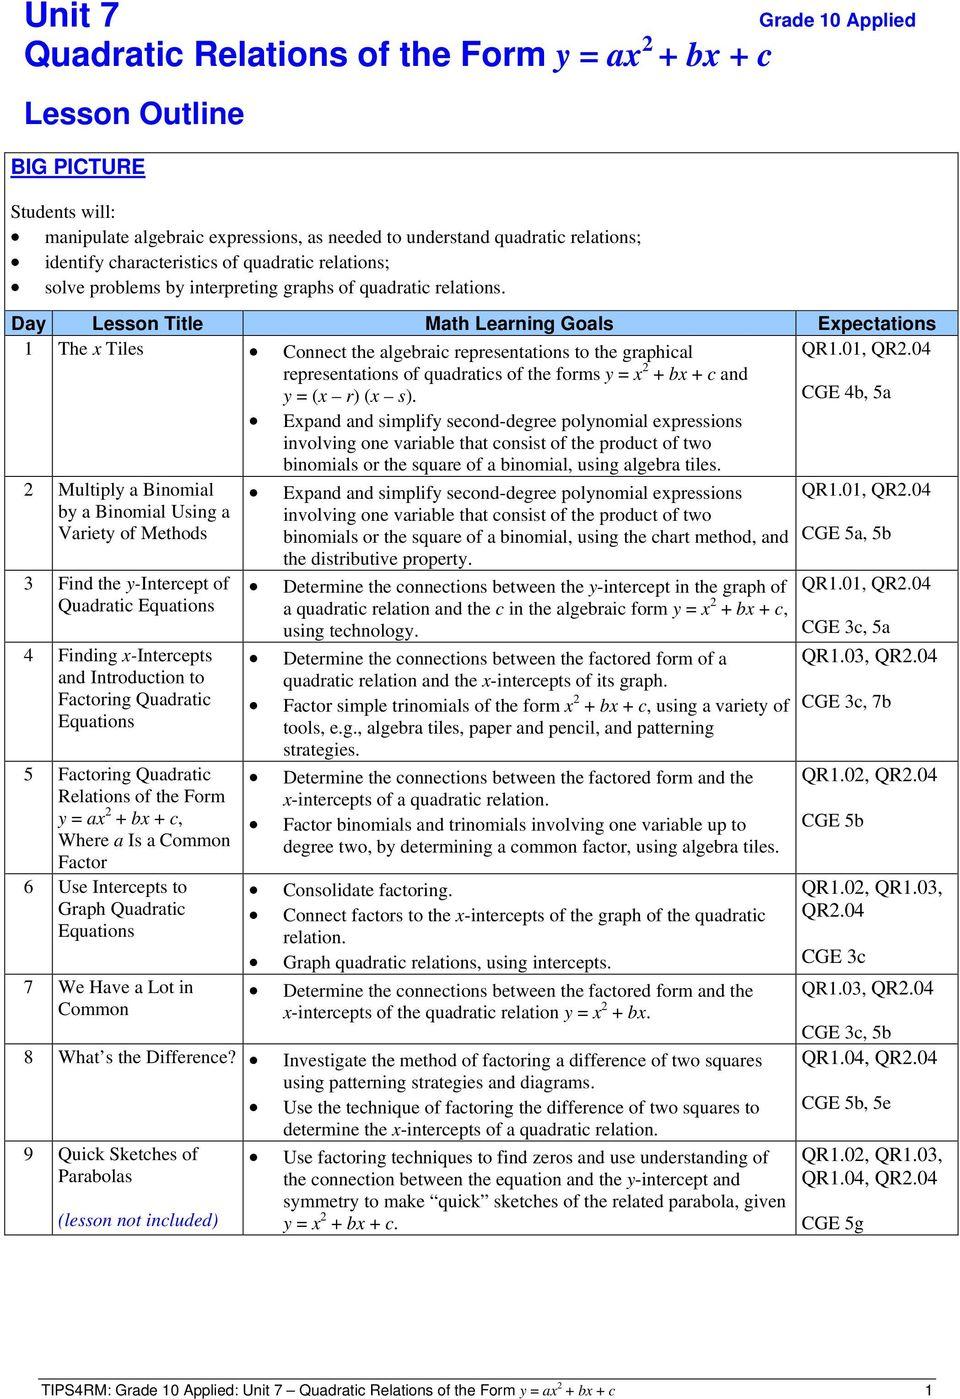 hight resolution of Unit 7 Quadratic Relations of the Form y \u003d ax 2 + bx + c - PDF Free Download